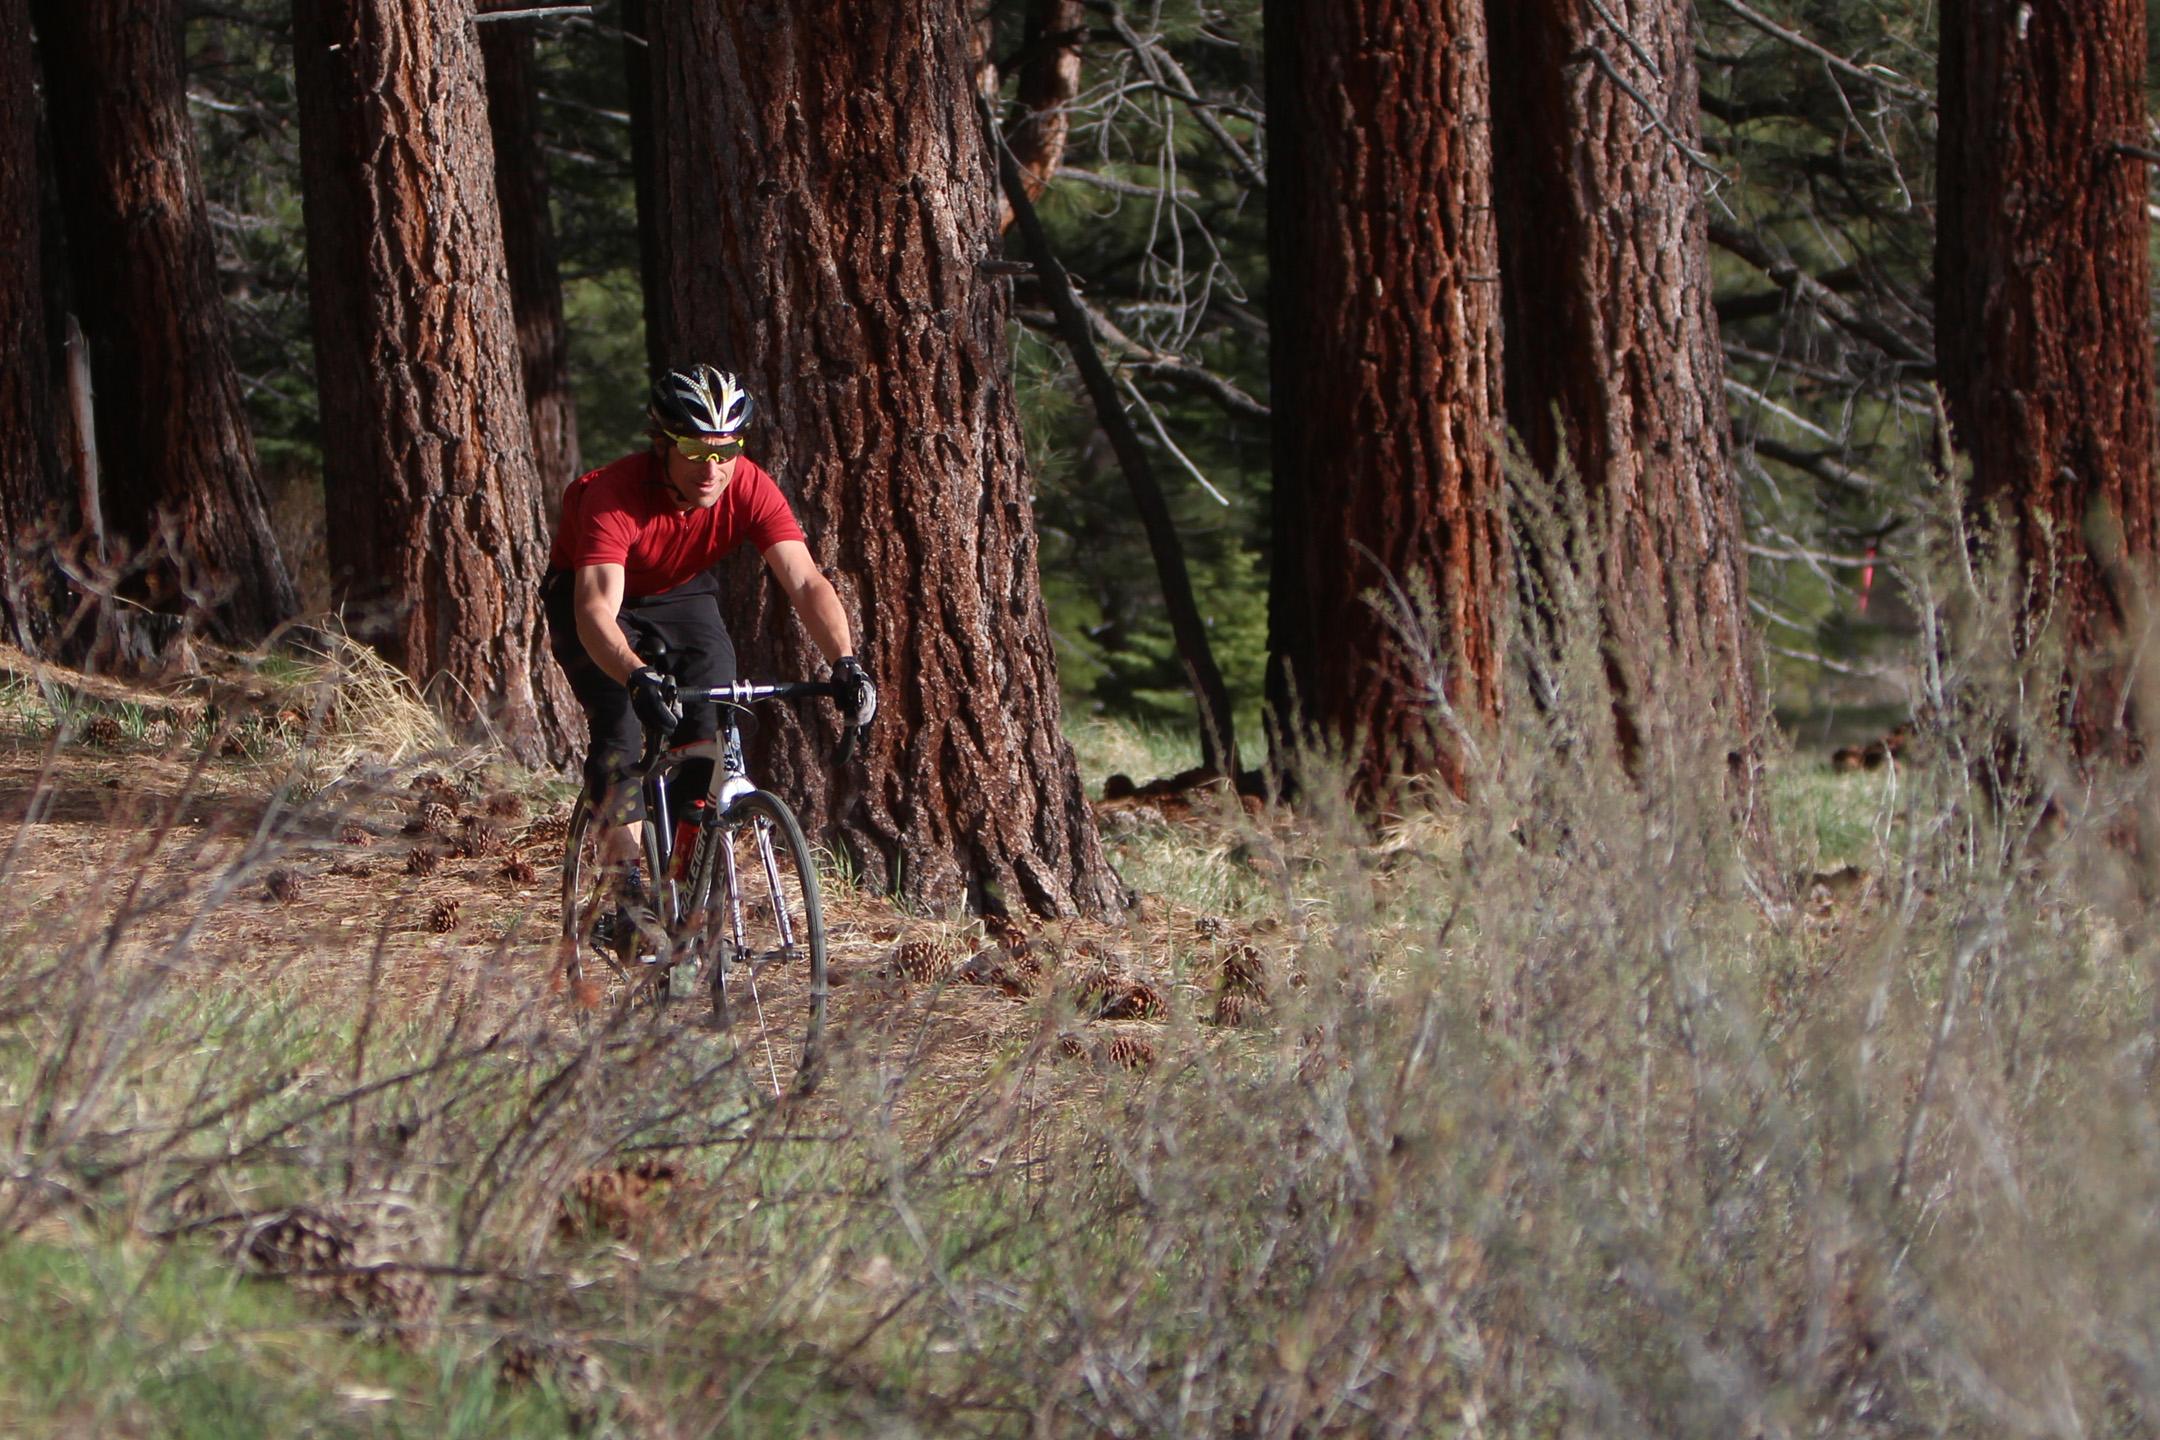 Paul on Hodala through pines